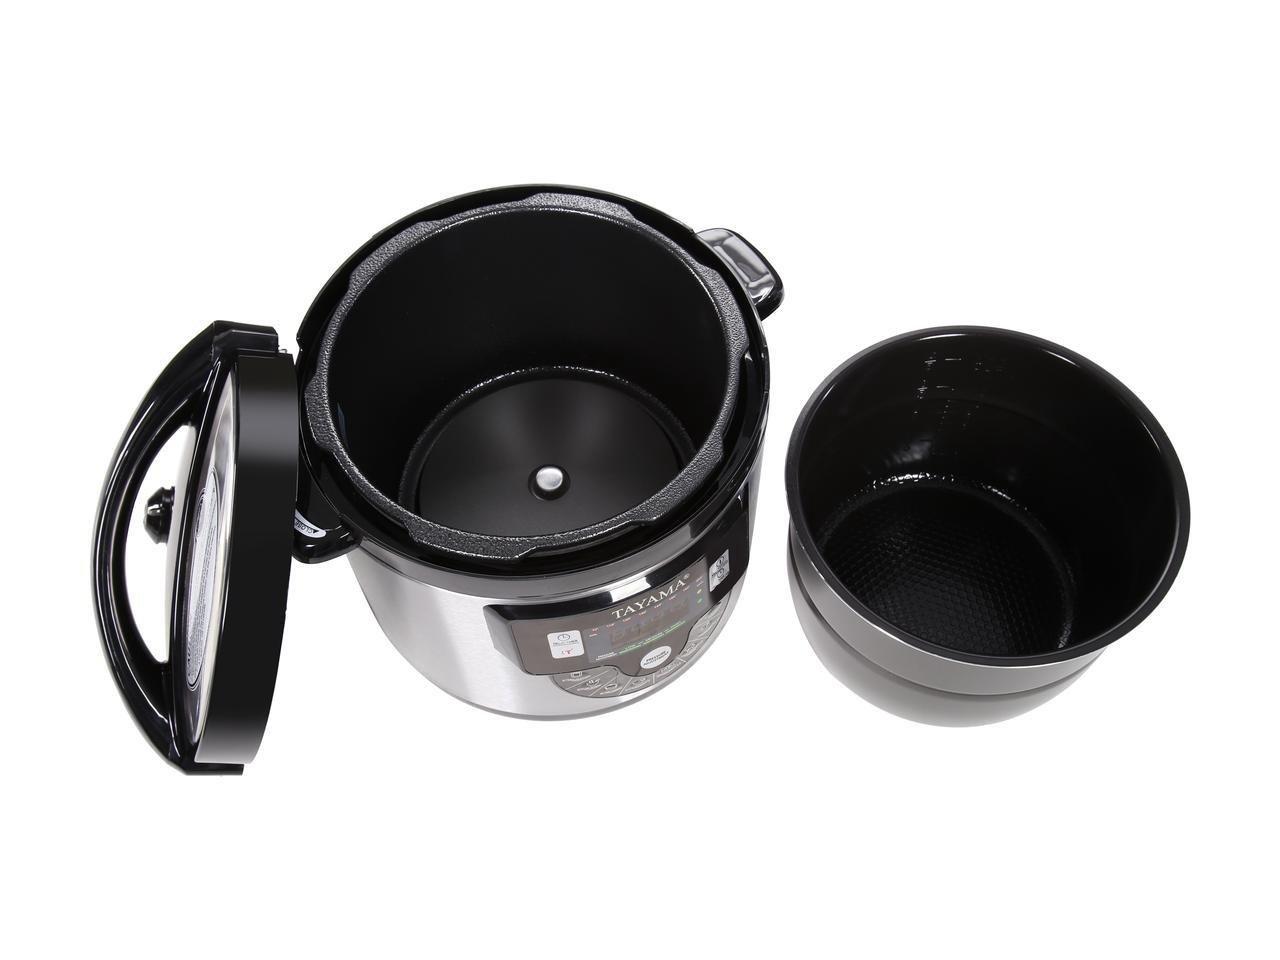 Tayama TMC-60XL 6 quart 8-in-1 Multi-Function Pressure Cooker, Black by TAYAMA (Image #8)